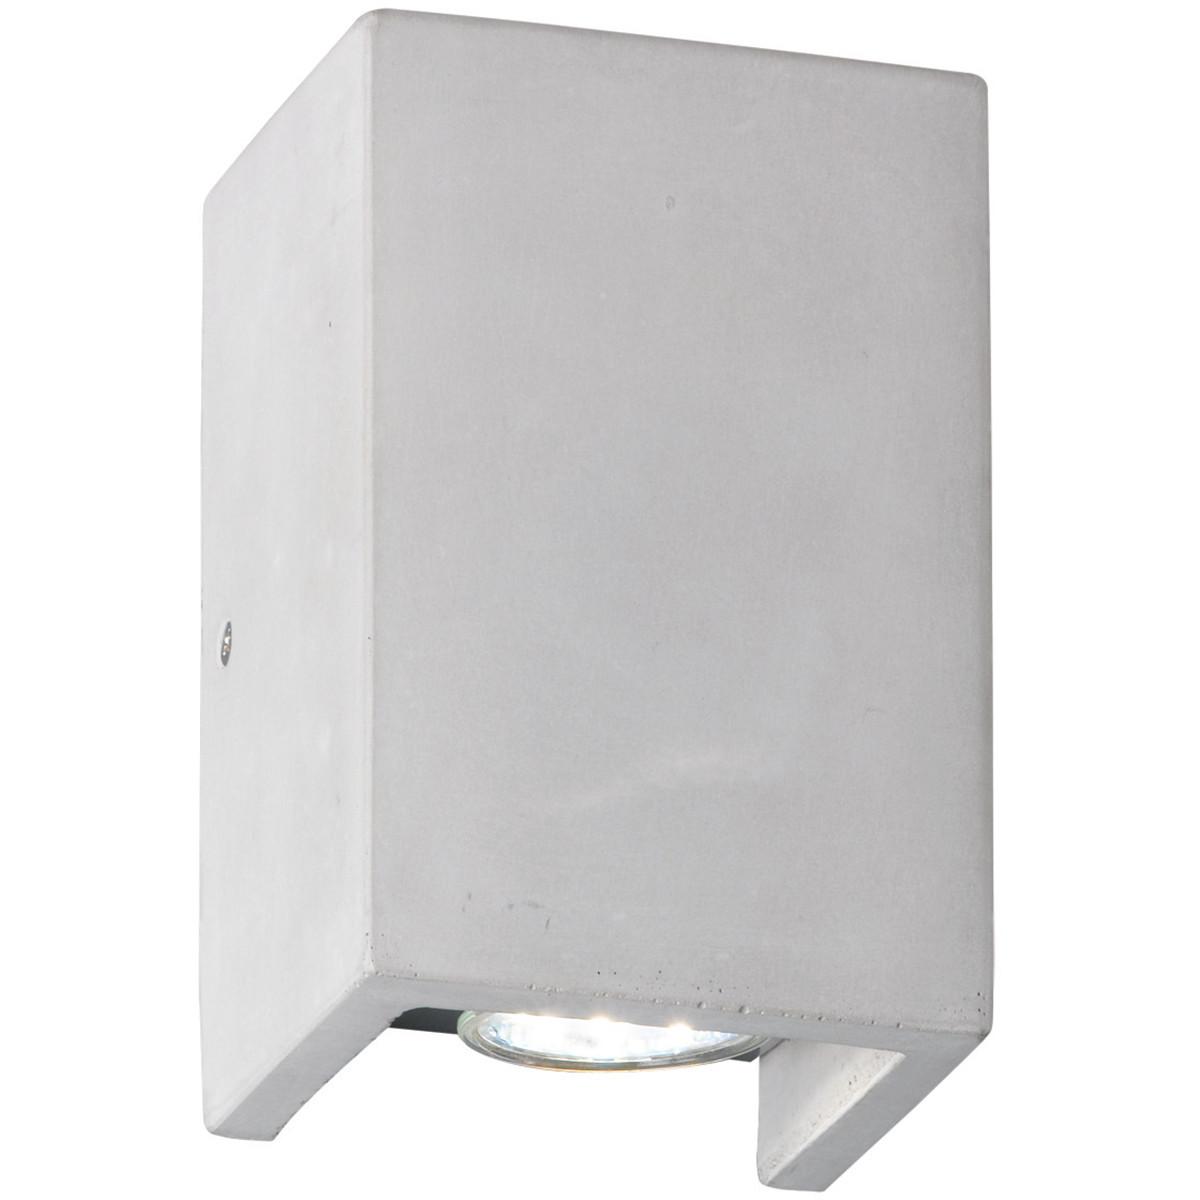 LED Wandlamp - Wandverlichting - Trion Cubin - GU10 Fitting - Rechthoek - Beton Look - Beton